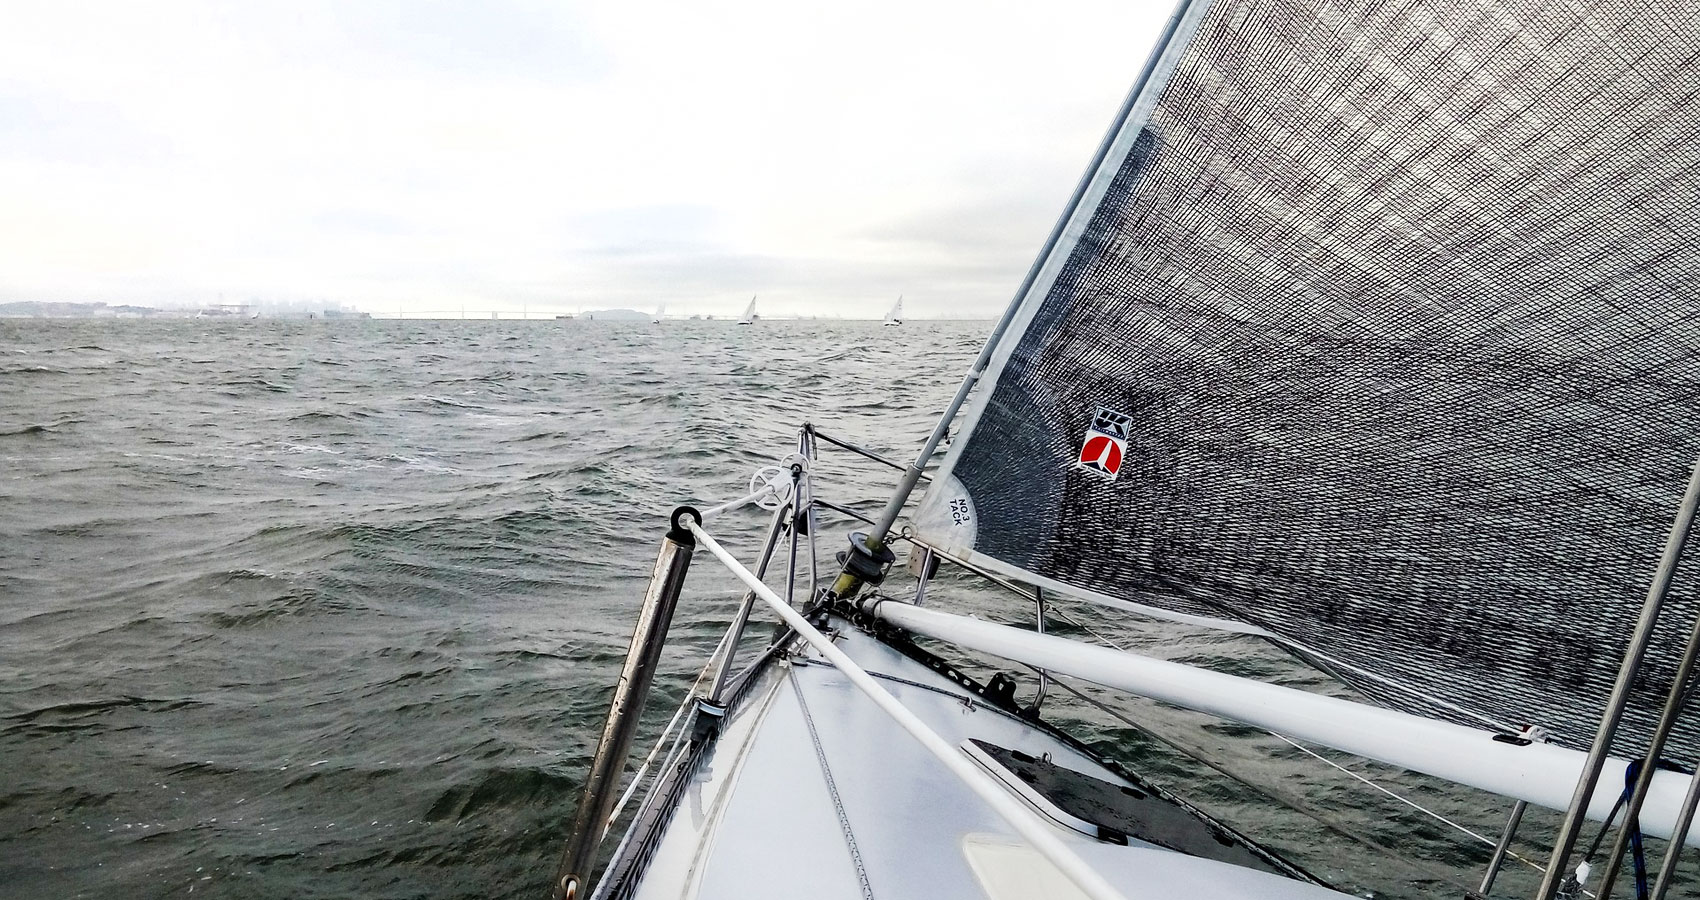 Regatta On The Atlantic, written by Joseph J. Breunig 3rd at Spillwords.com